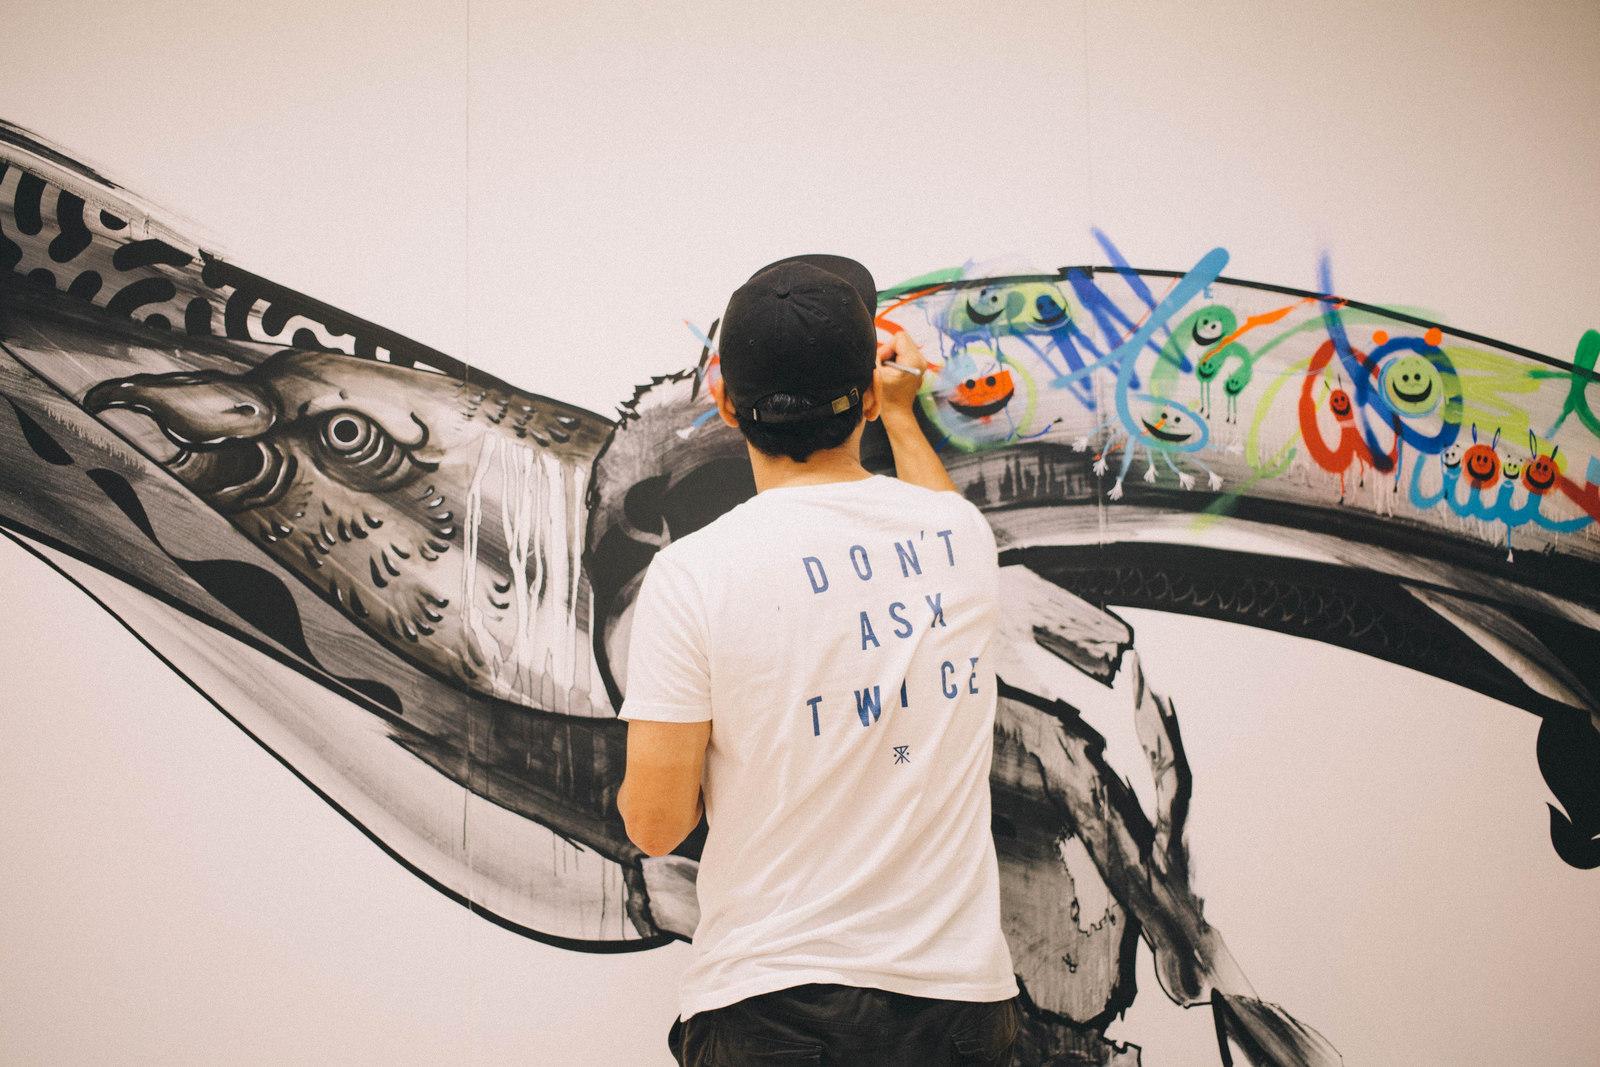 IMG_1416 国内外で活躍するアーティスト4組の「作品の向こう側」| ジャーナル スタンダード「オムニバス展」密着レポート!